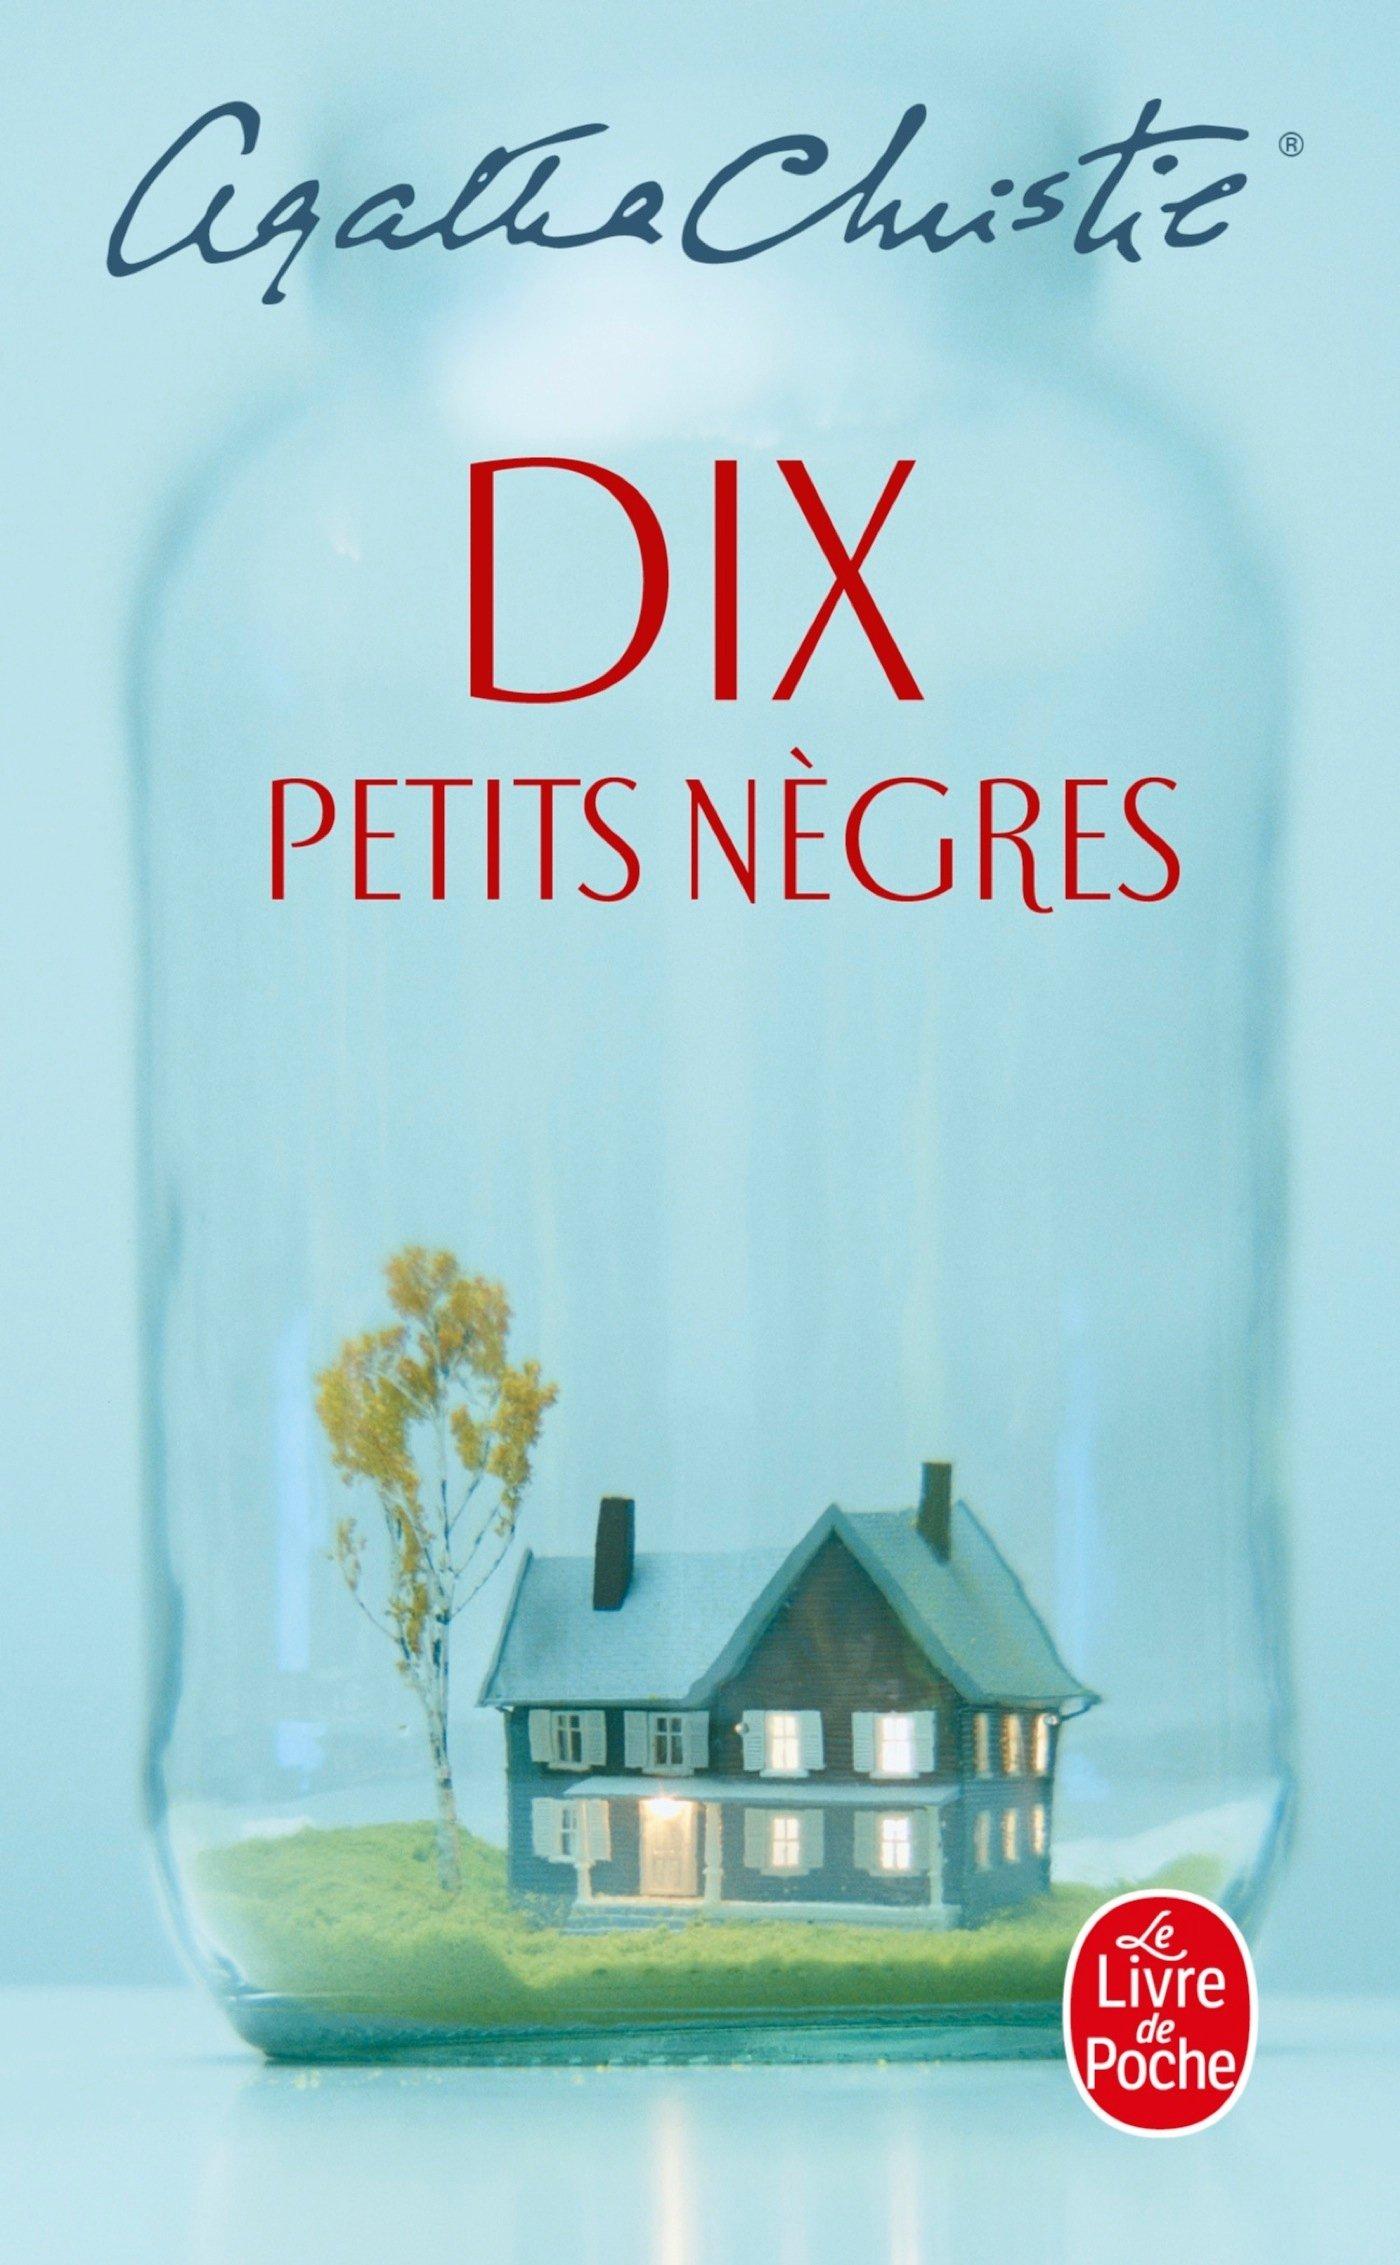 Dix Petits Nègres (Le Livre de Poche) (French Edition) ebook